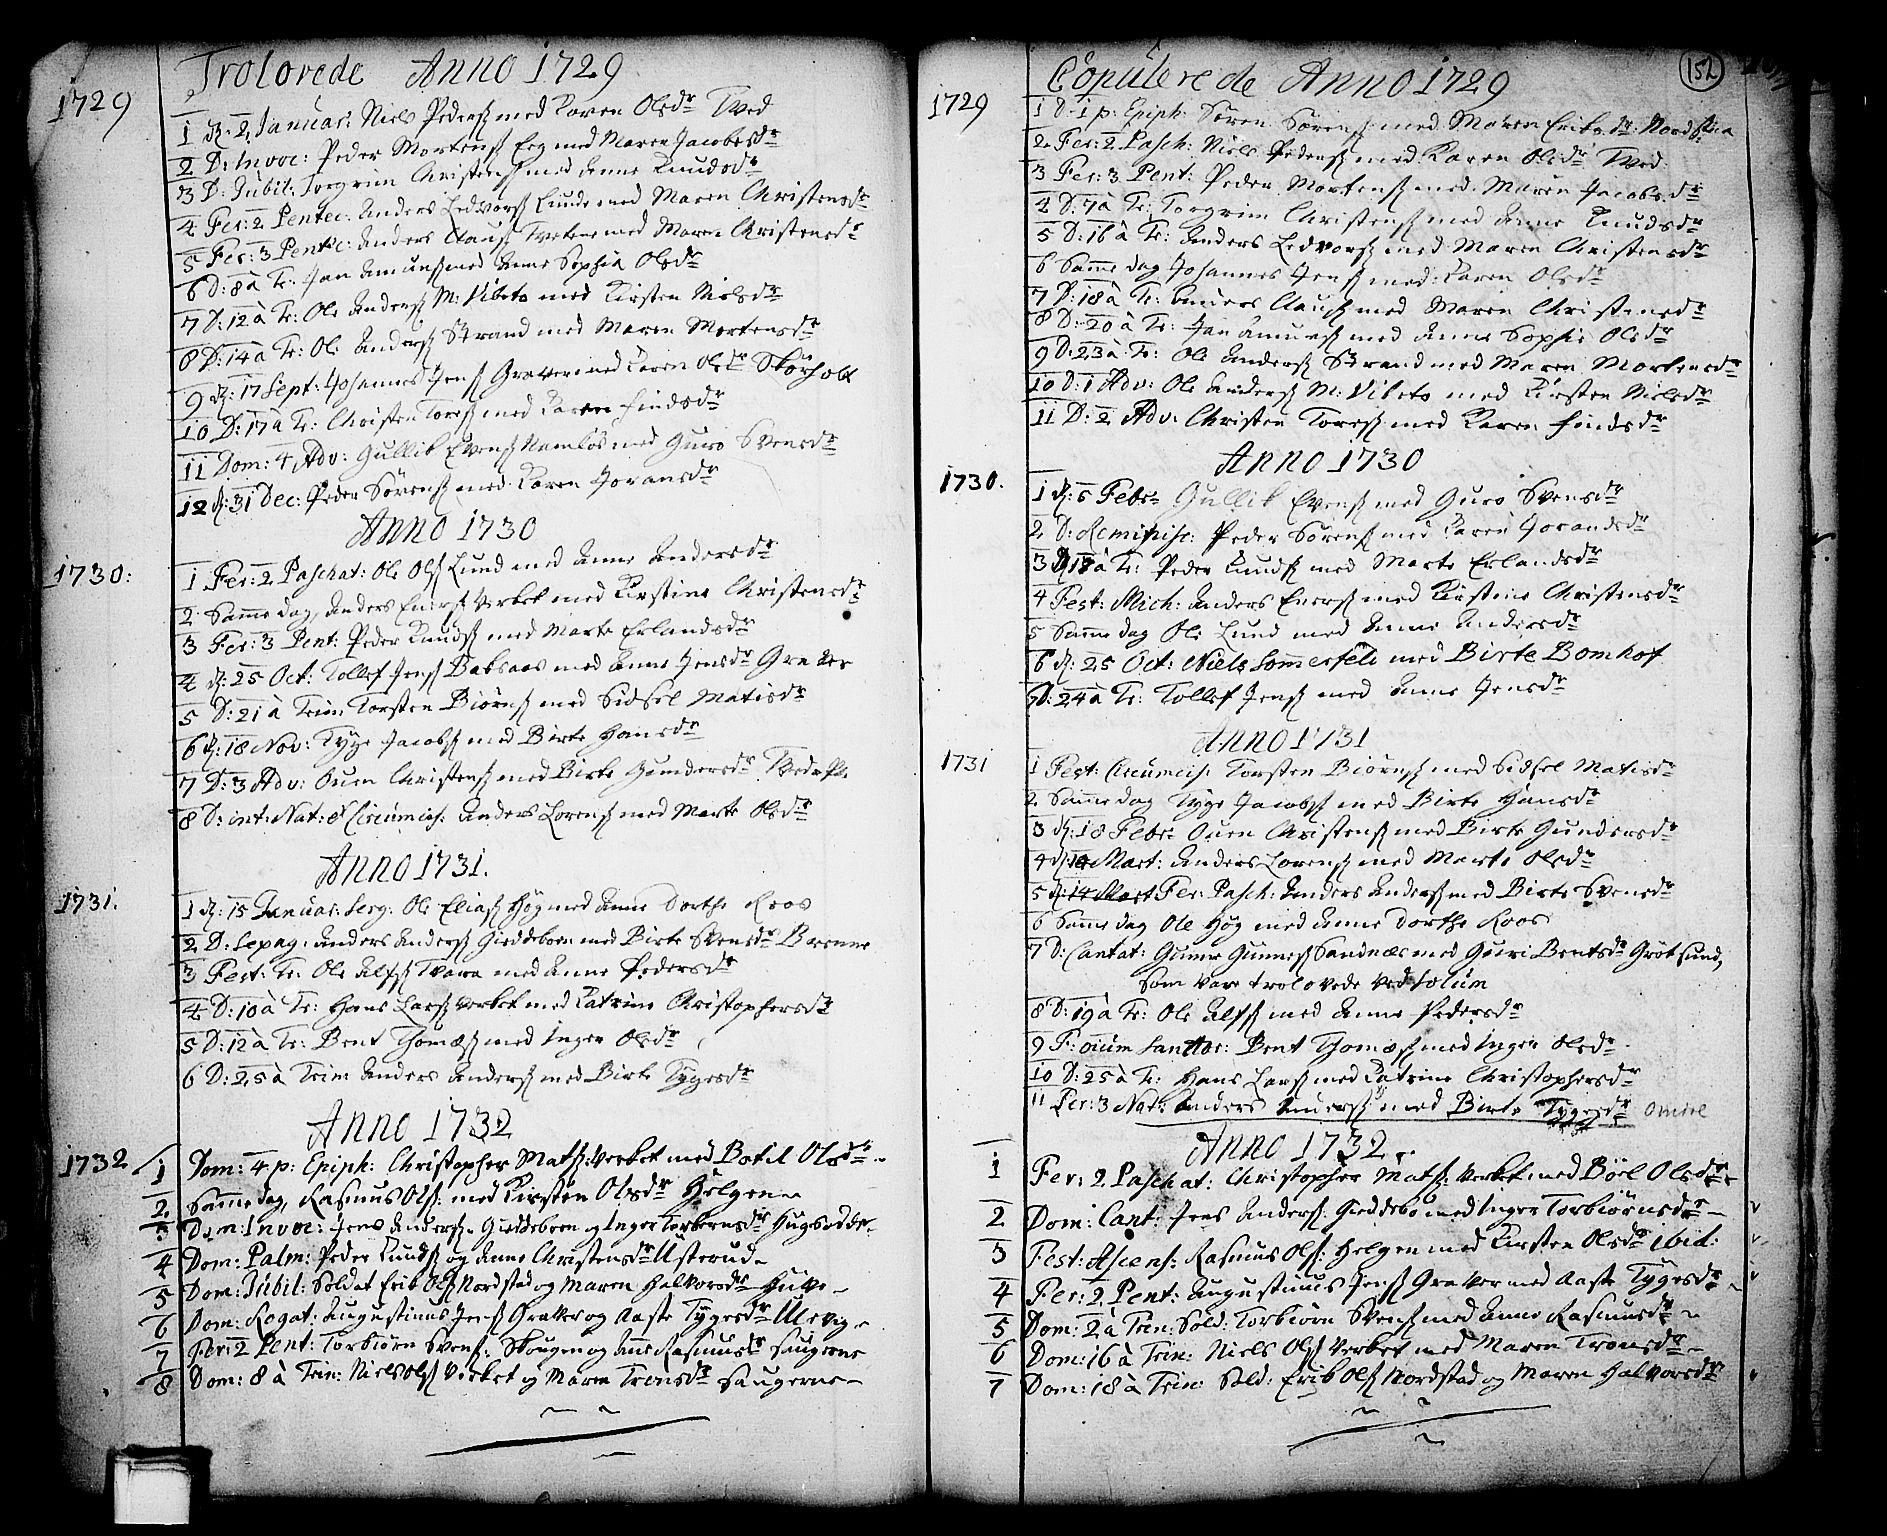 SAKO, Holla kirkebøker, F/Fa/L0001: Ministerialbok nr. 1, 1717-1779, s. 152